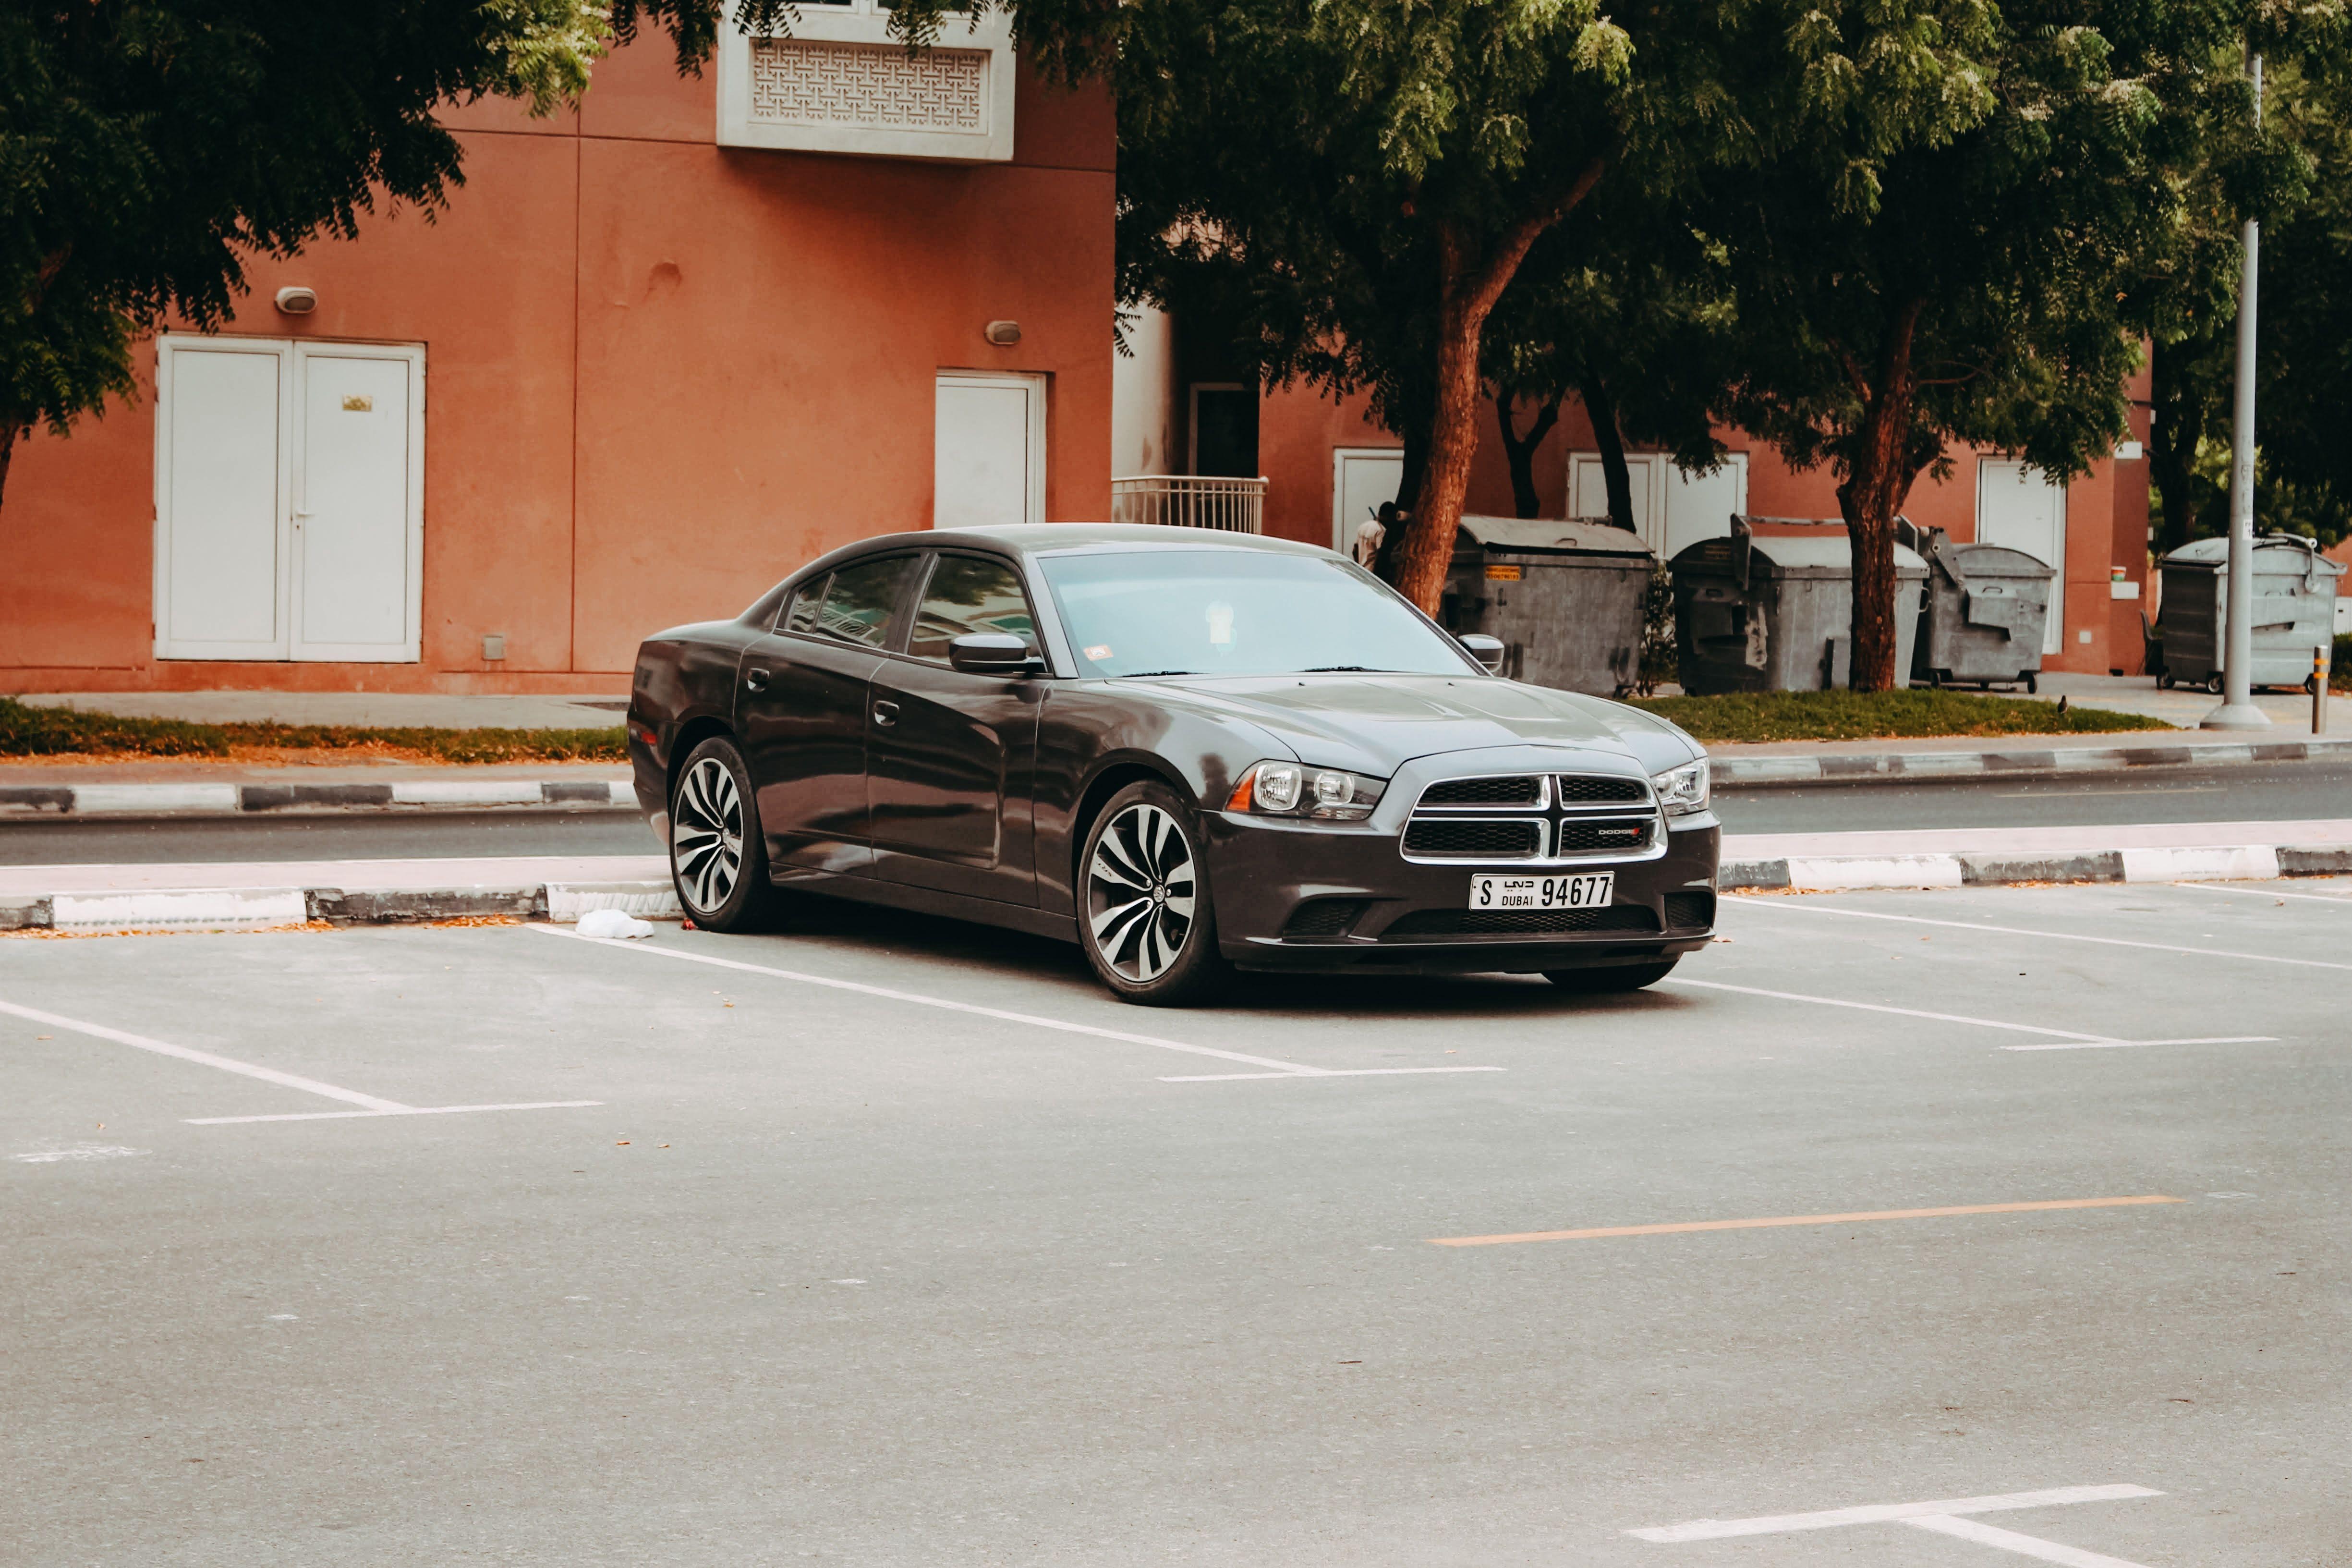 Private Rent A Car In 2020 Car Rental Car Long Term Car Rental